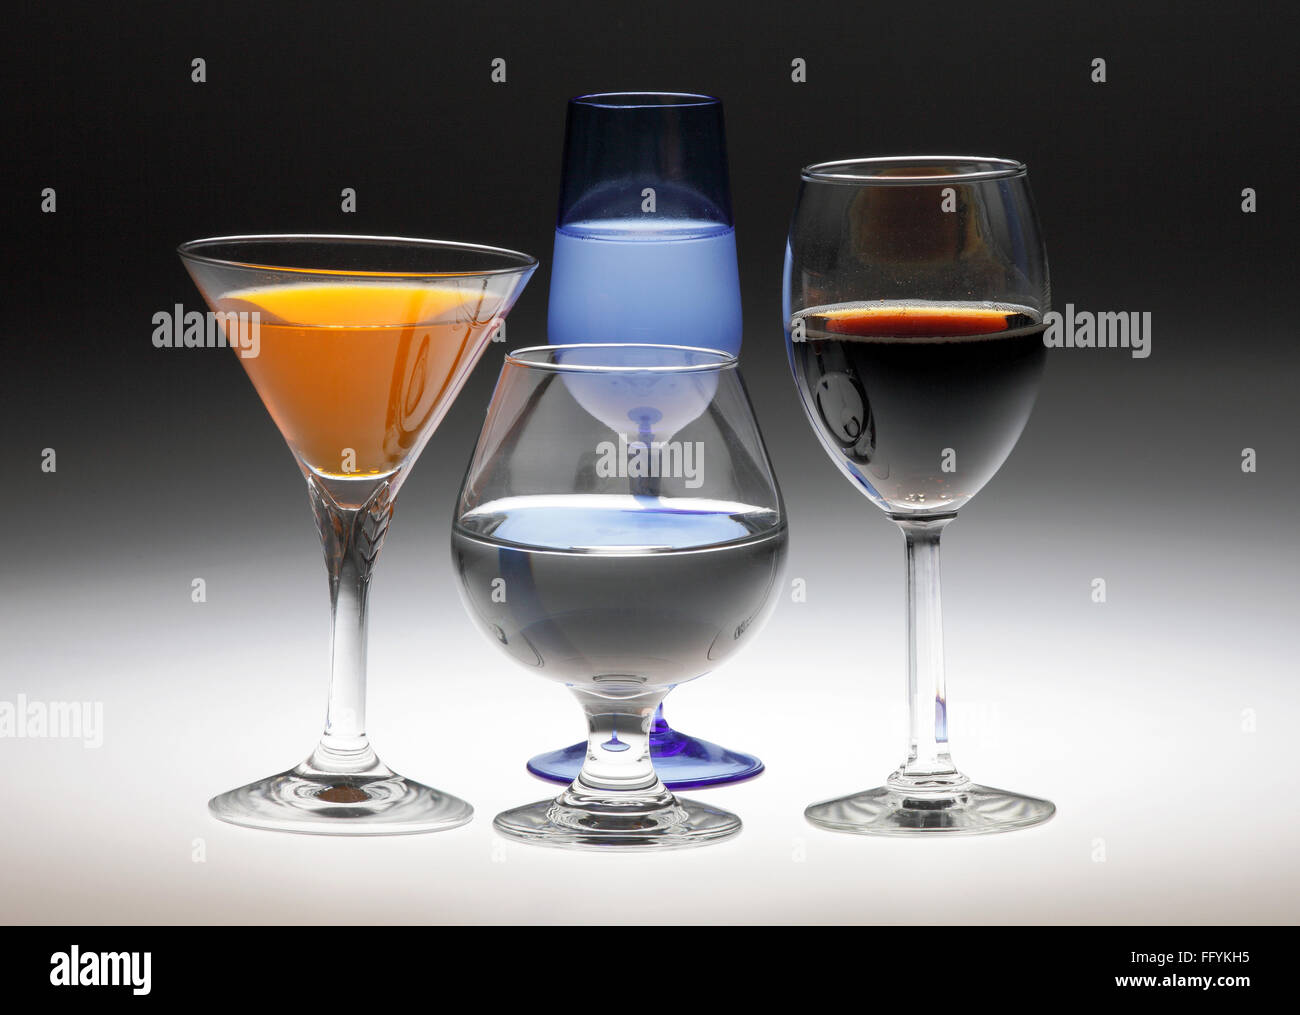 Trink Gläser Glaswaren Indien Stockbild